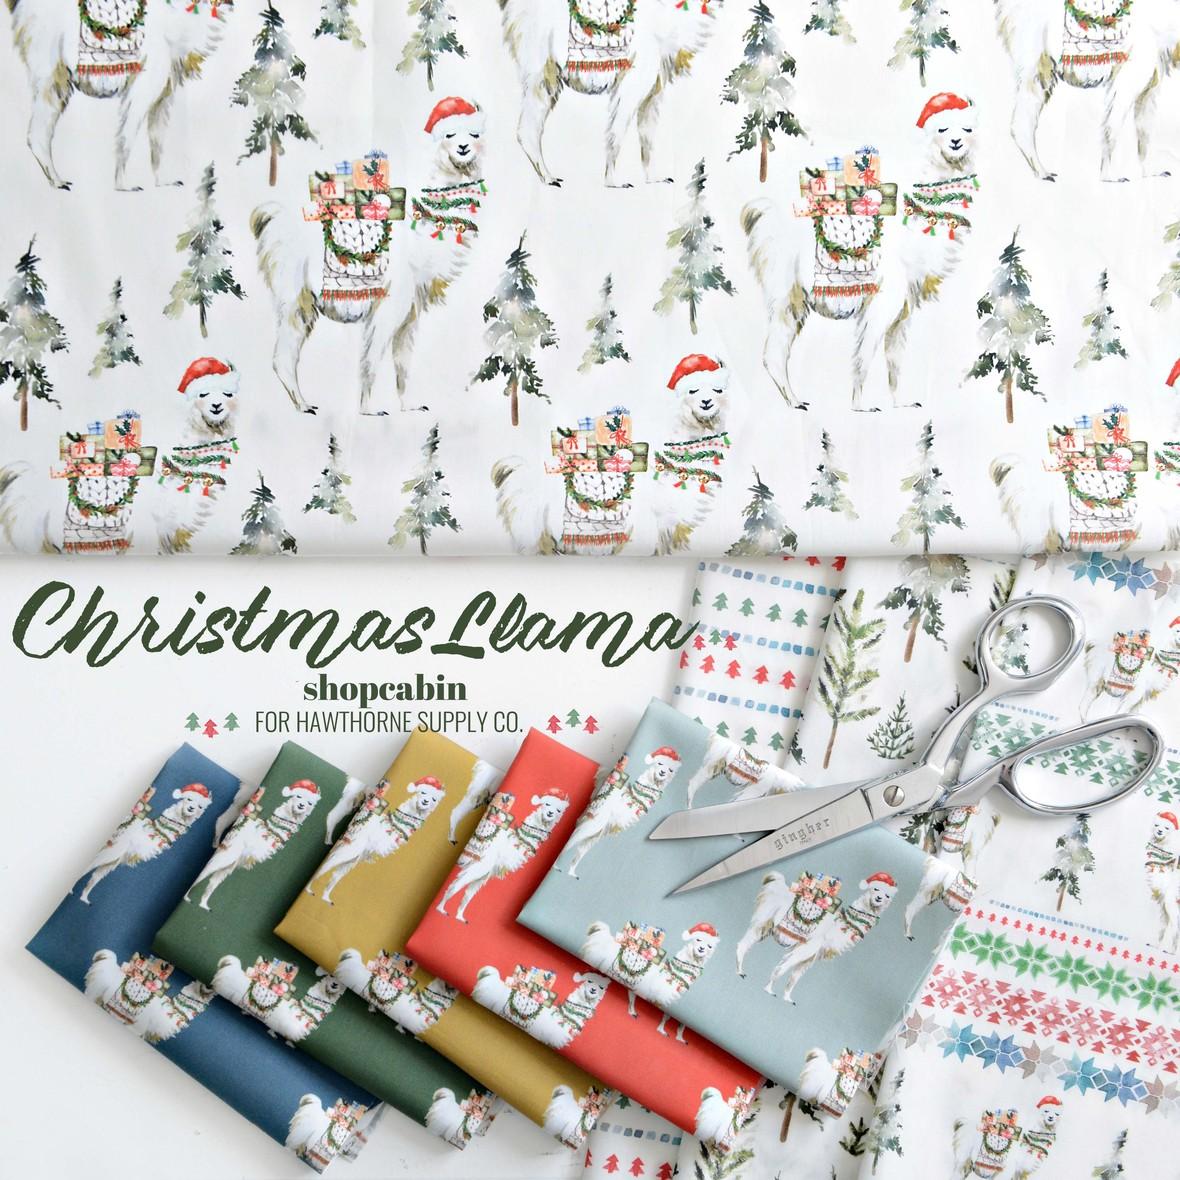 Christmas Llama Fabric Poster Shopcabin at Hawthorne Supply Co